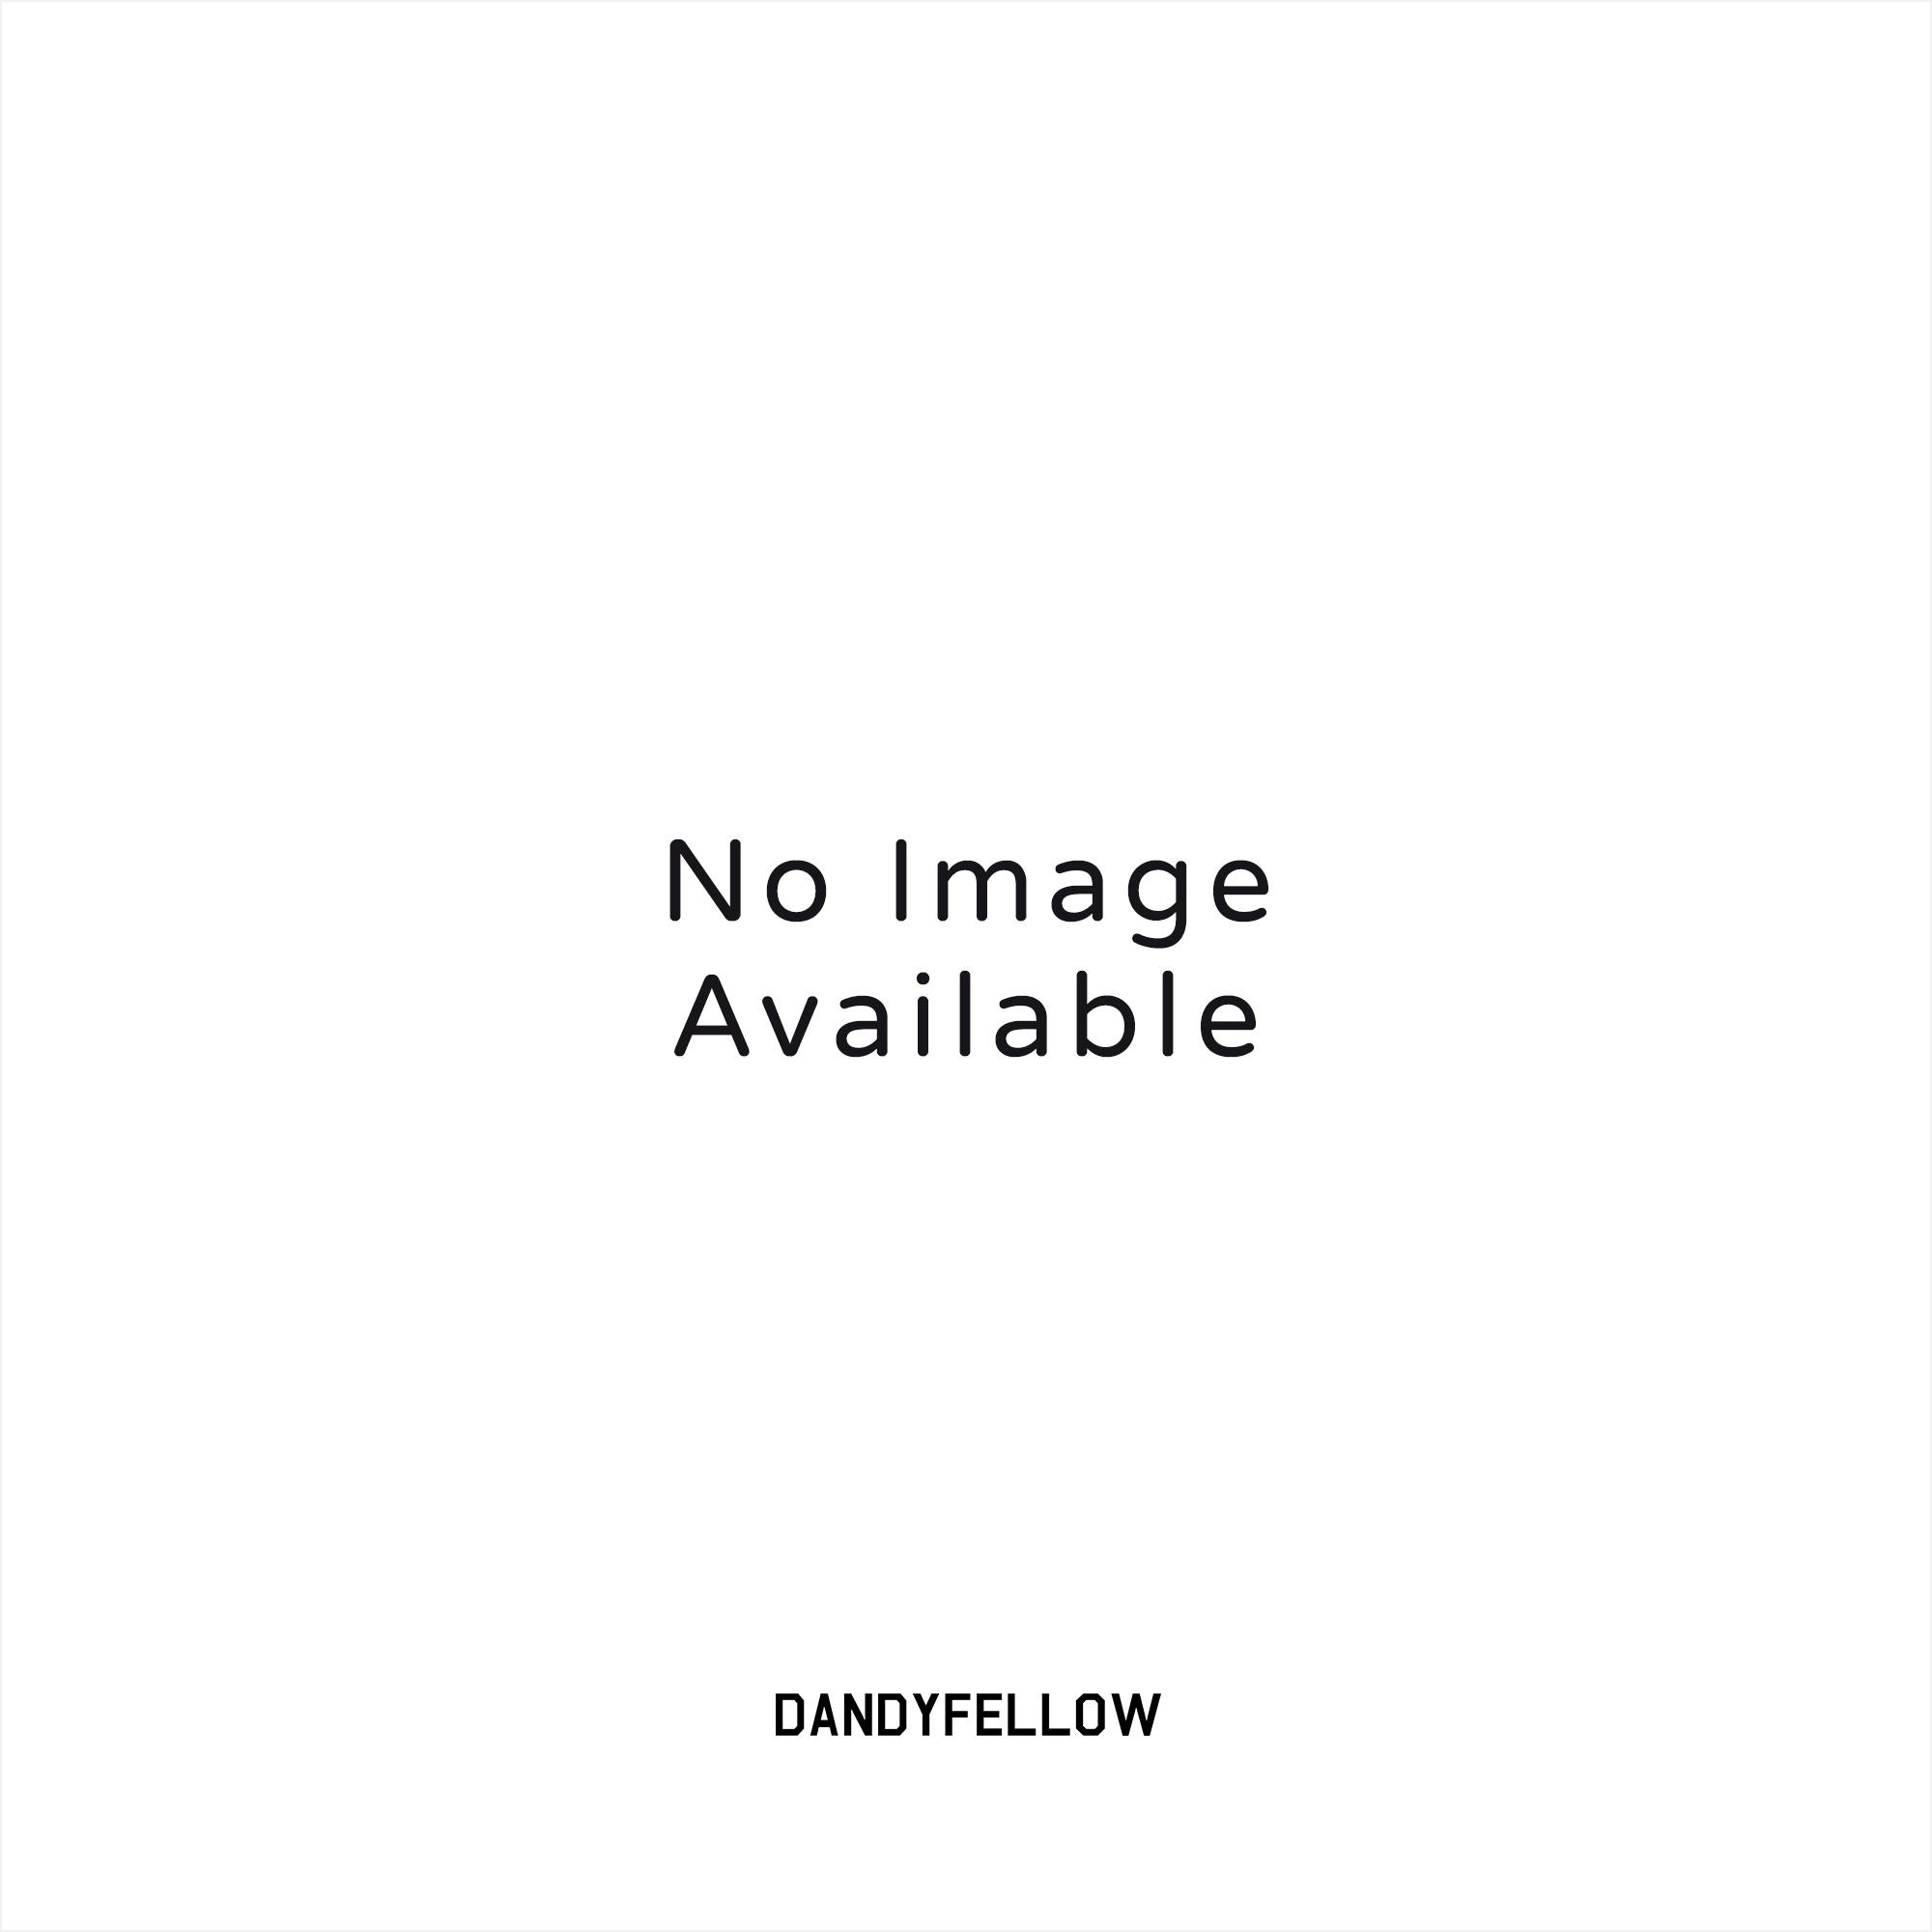 Paul Smith Merino Wool Navy Jumper PRXD-991P-220